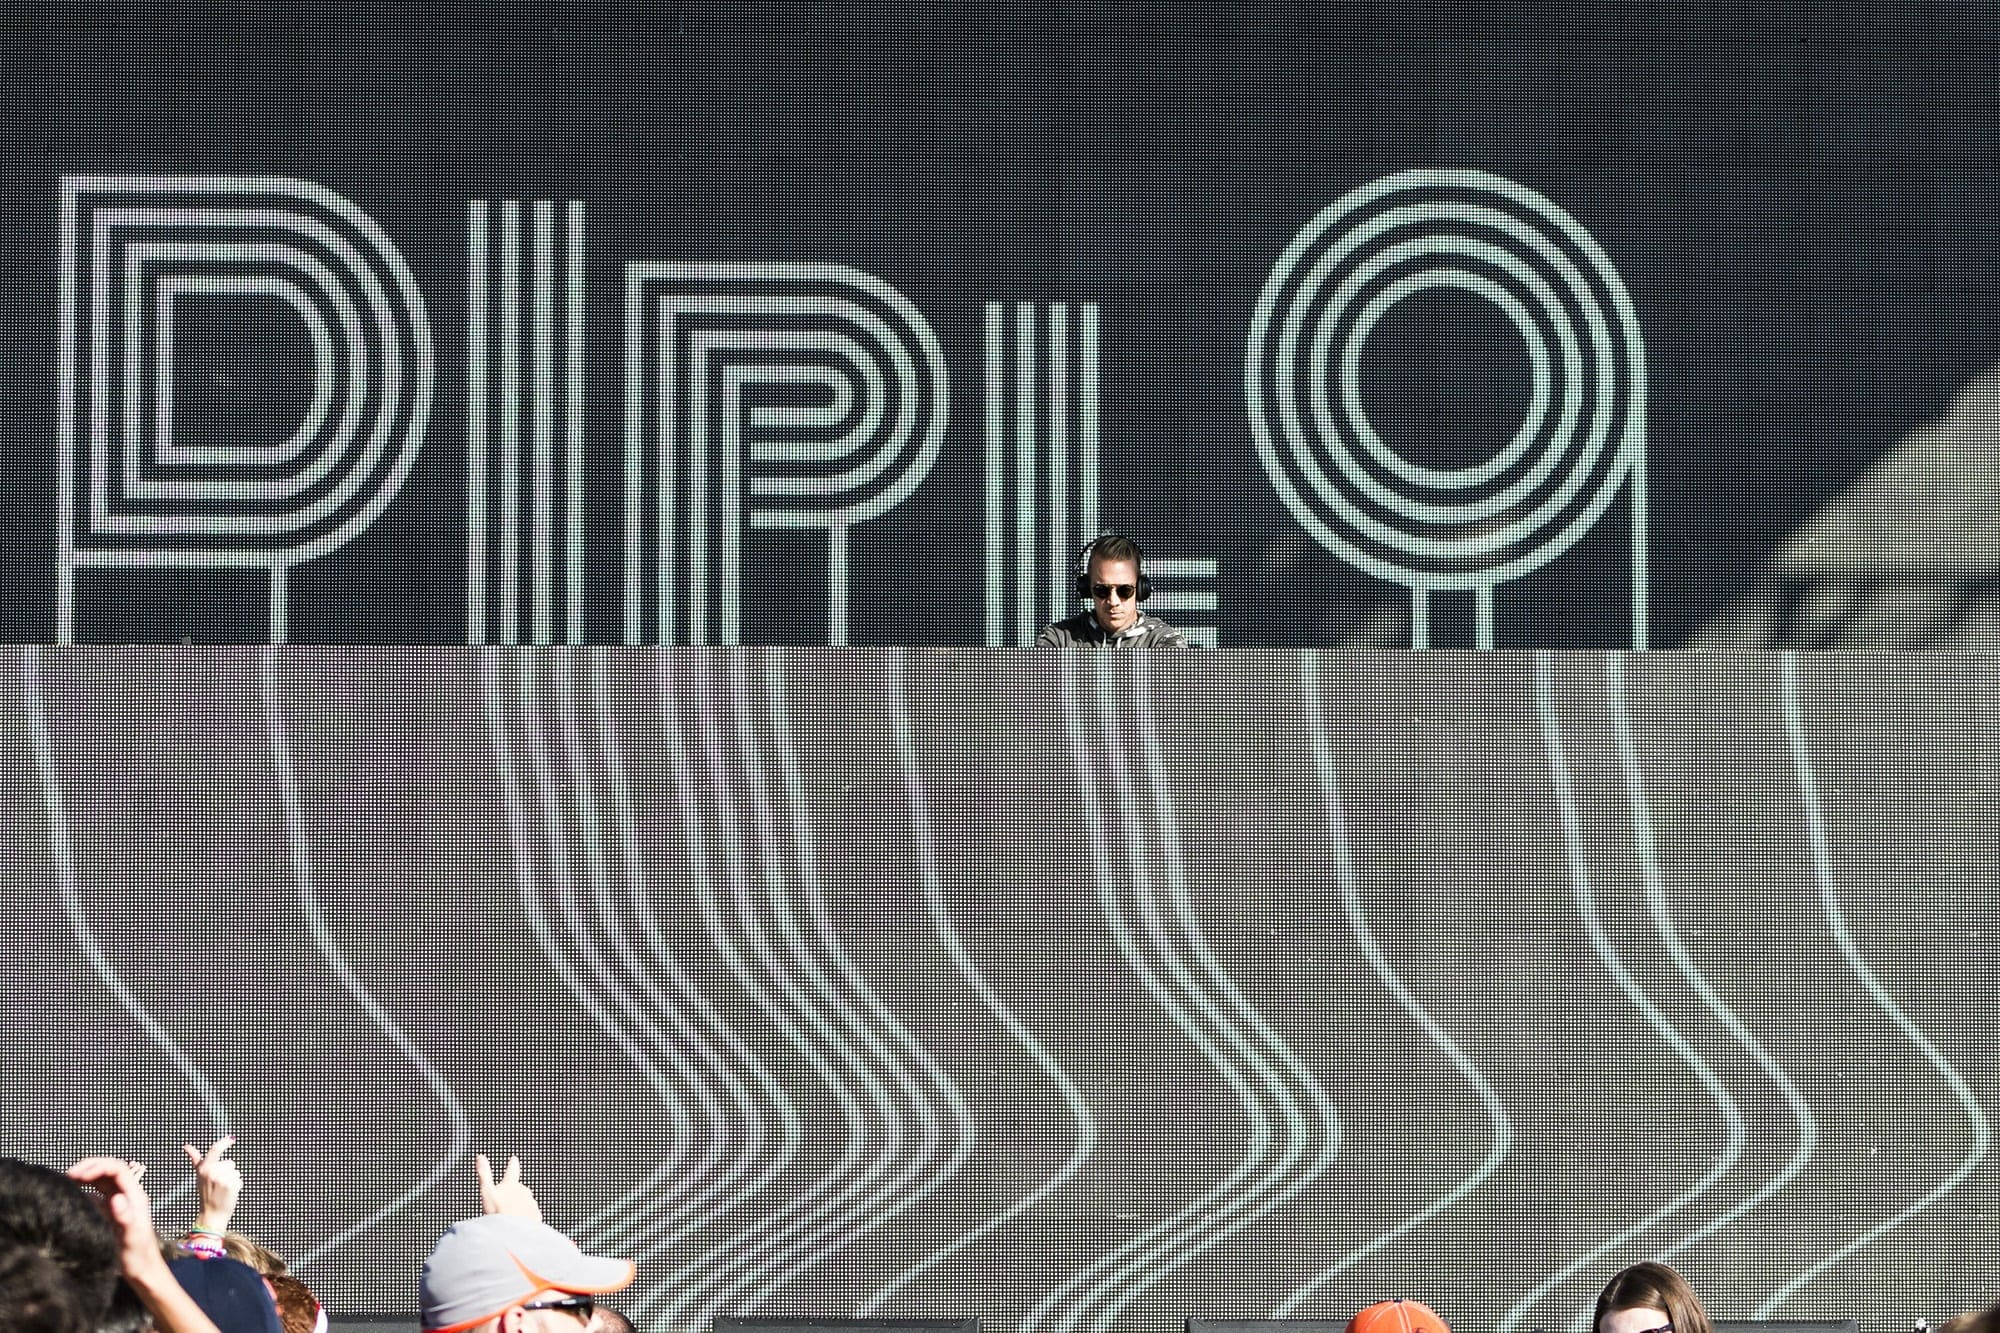 Diplo at Juice Jam 2017